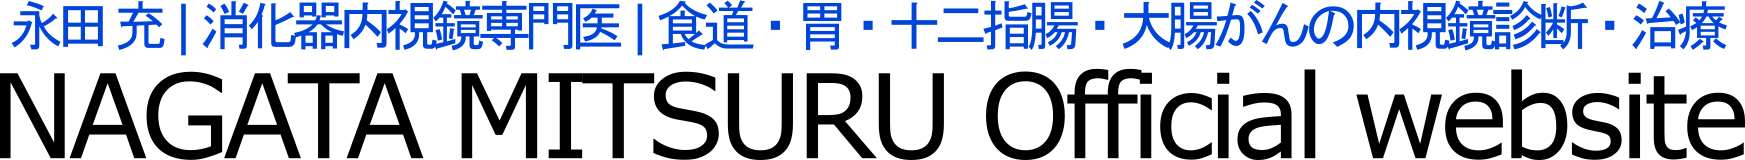 永田充 公式サイト|食道・胃・十二指腸・大腸がん内視鏡治療専門医